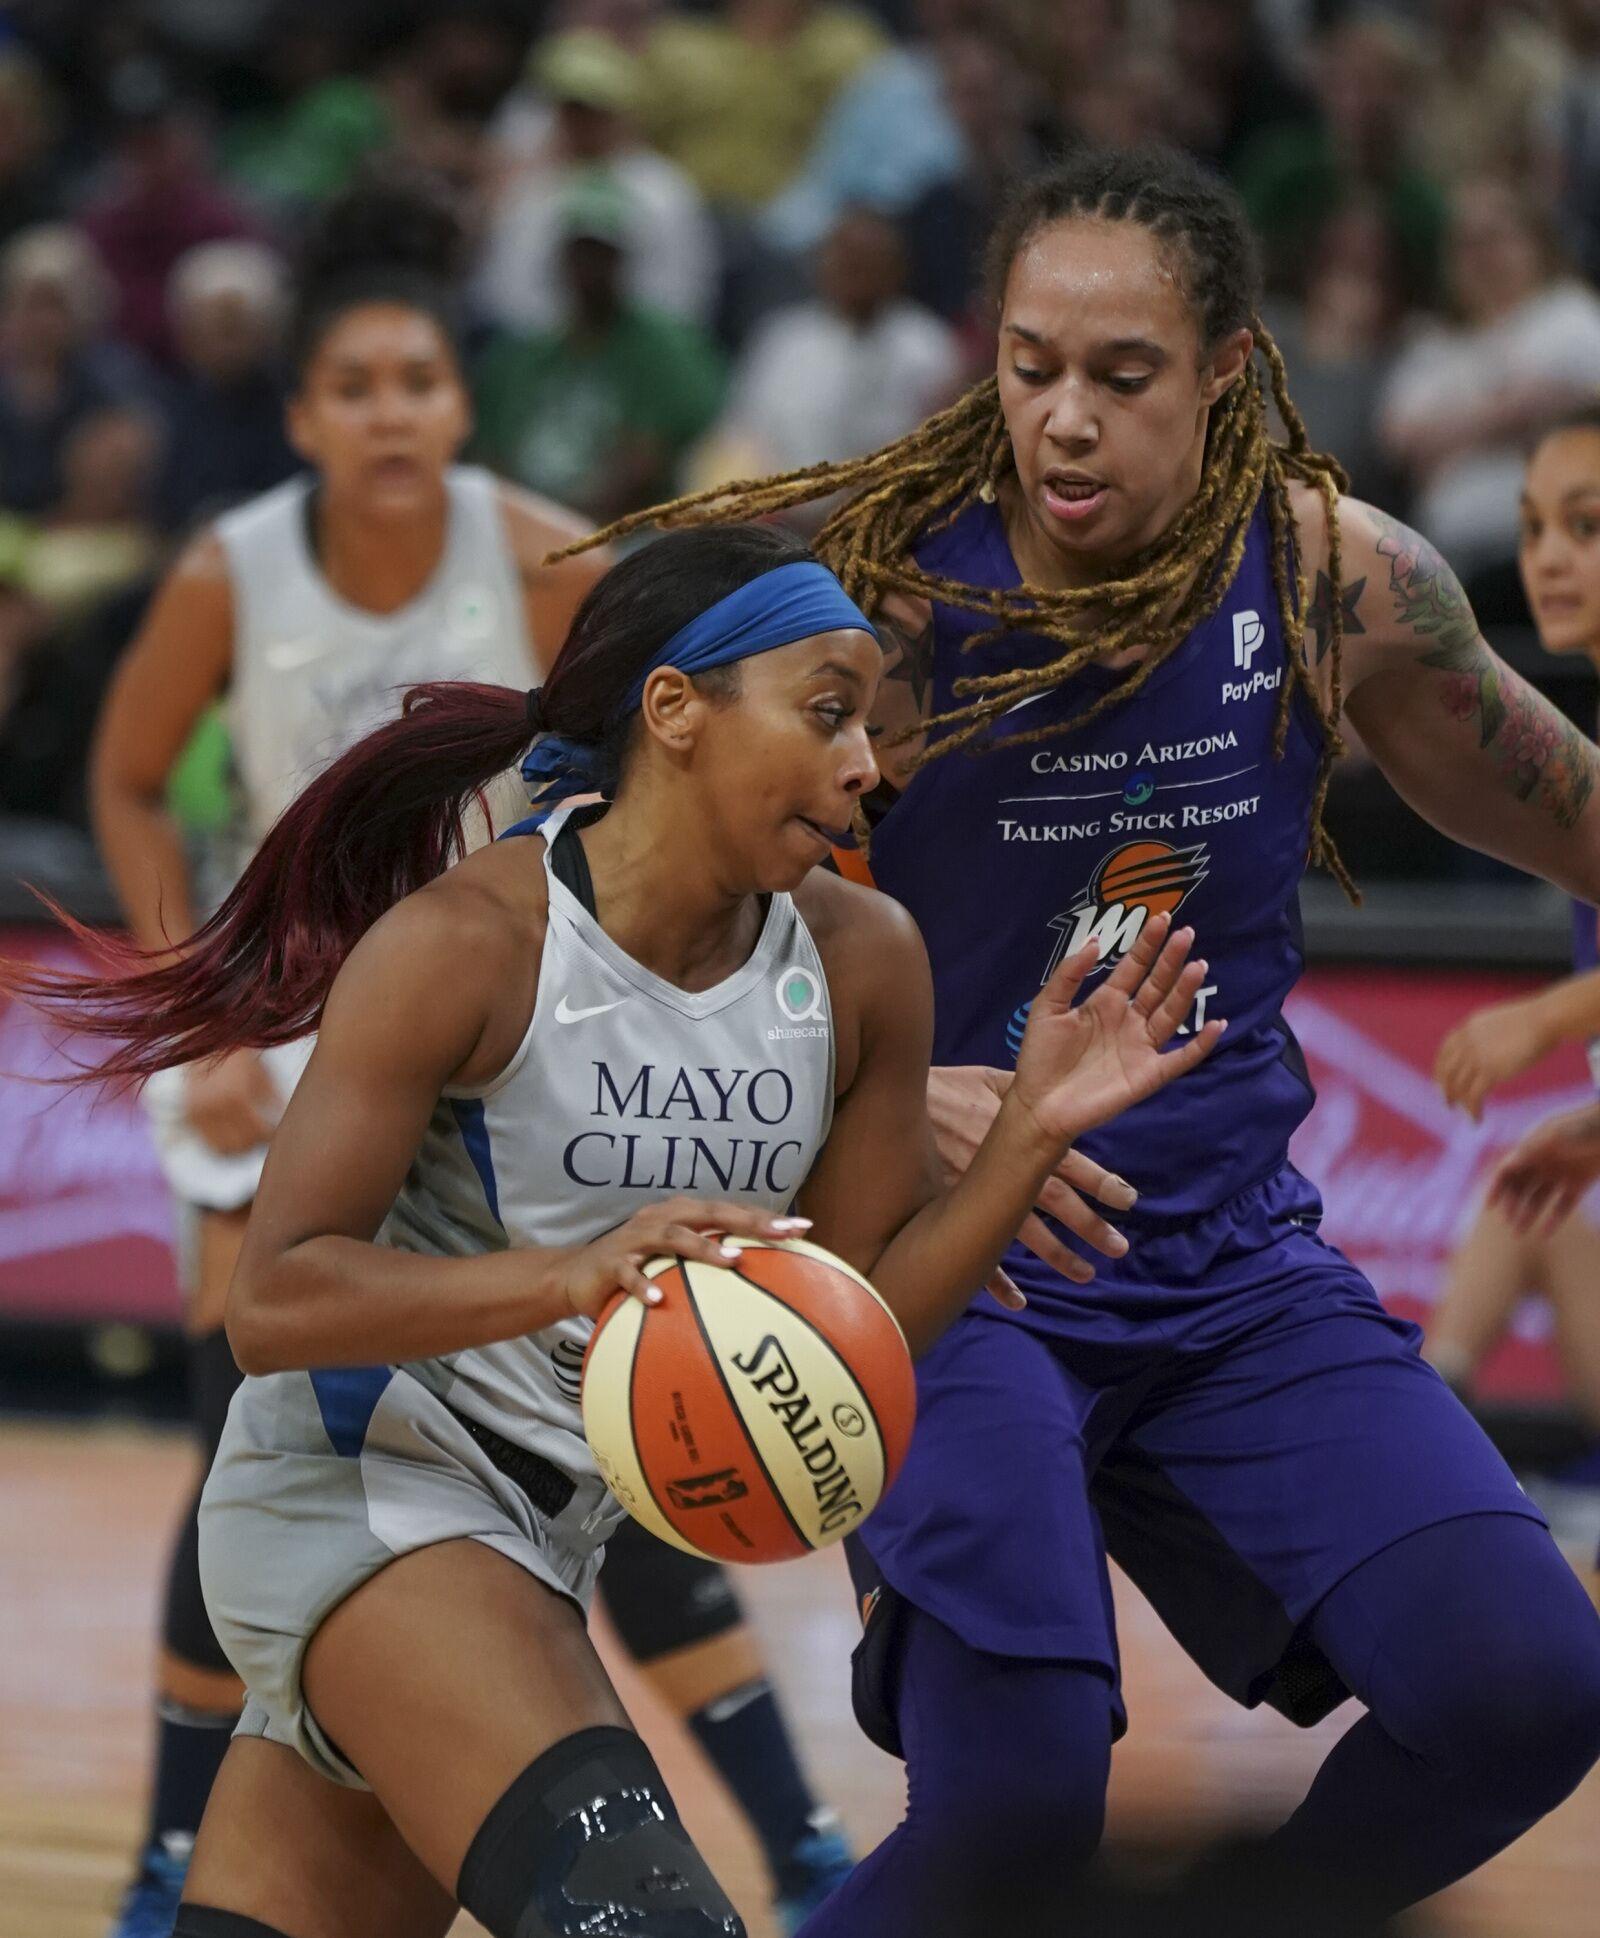 WNBA news: Takeaways from Lynx win over Mercury